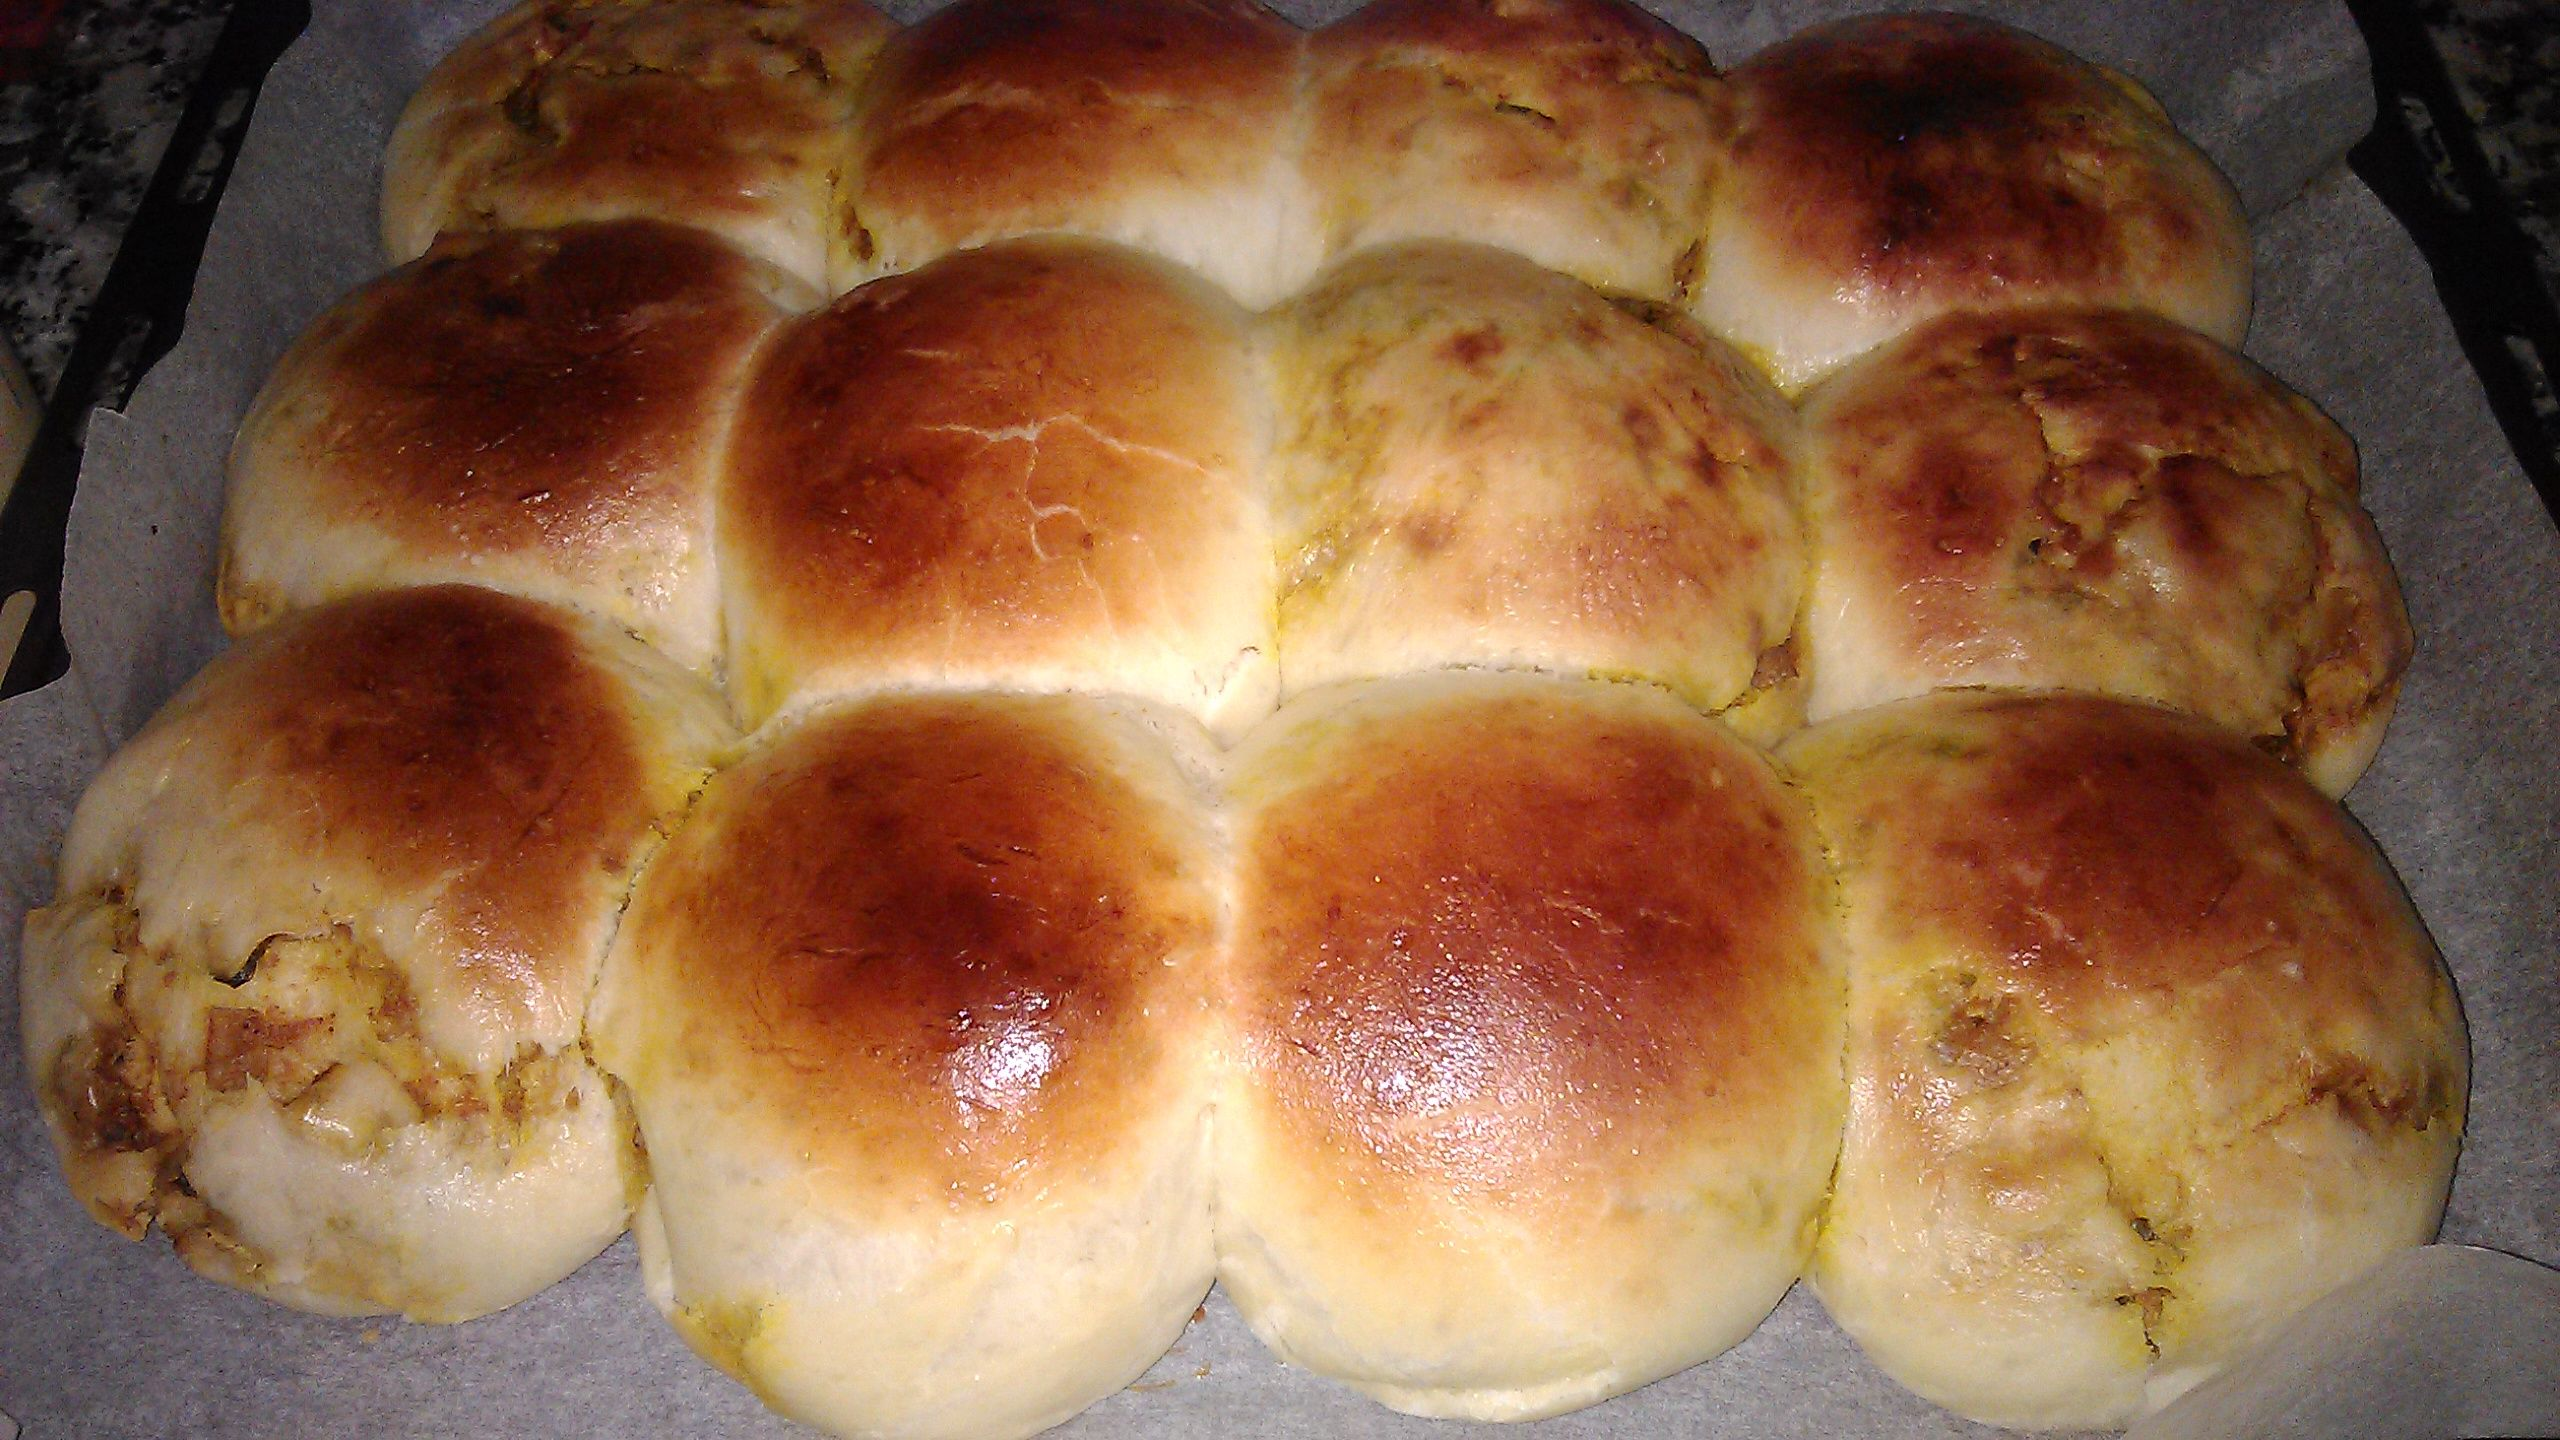 Beehive Stuffed Buns Khaliat Nahal طريقة عمل خلية النحل بالدجاج خليه نحل محشيه Quick Desserts Hot Dog Buns Food